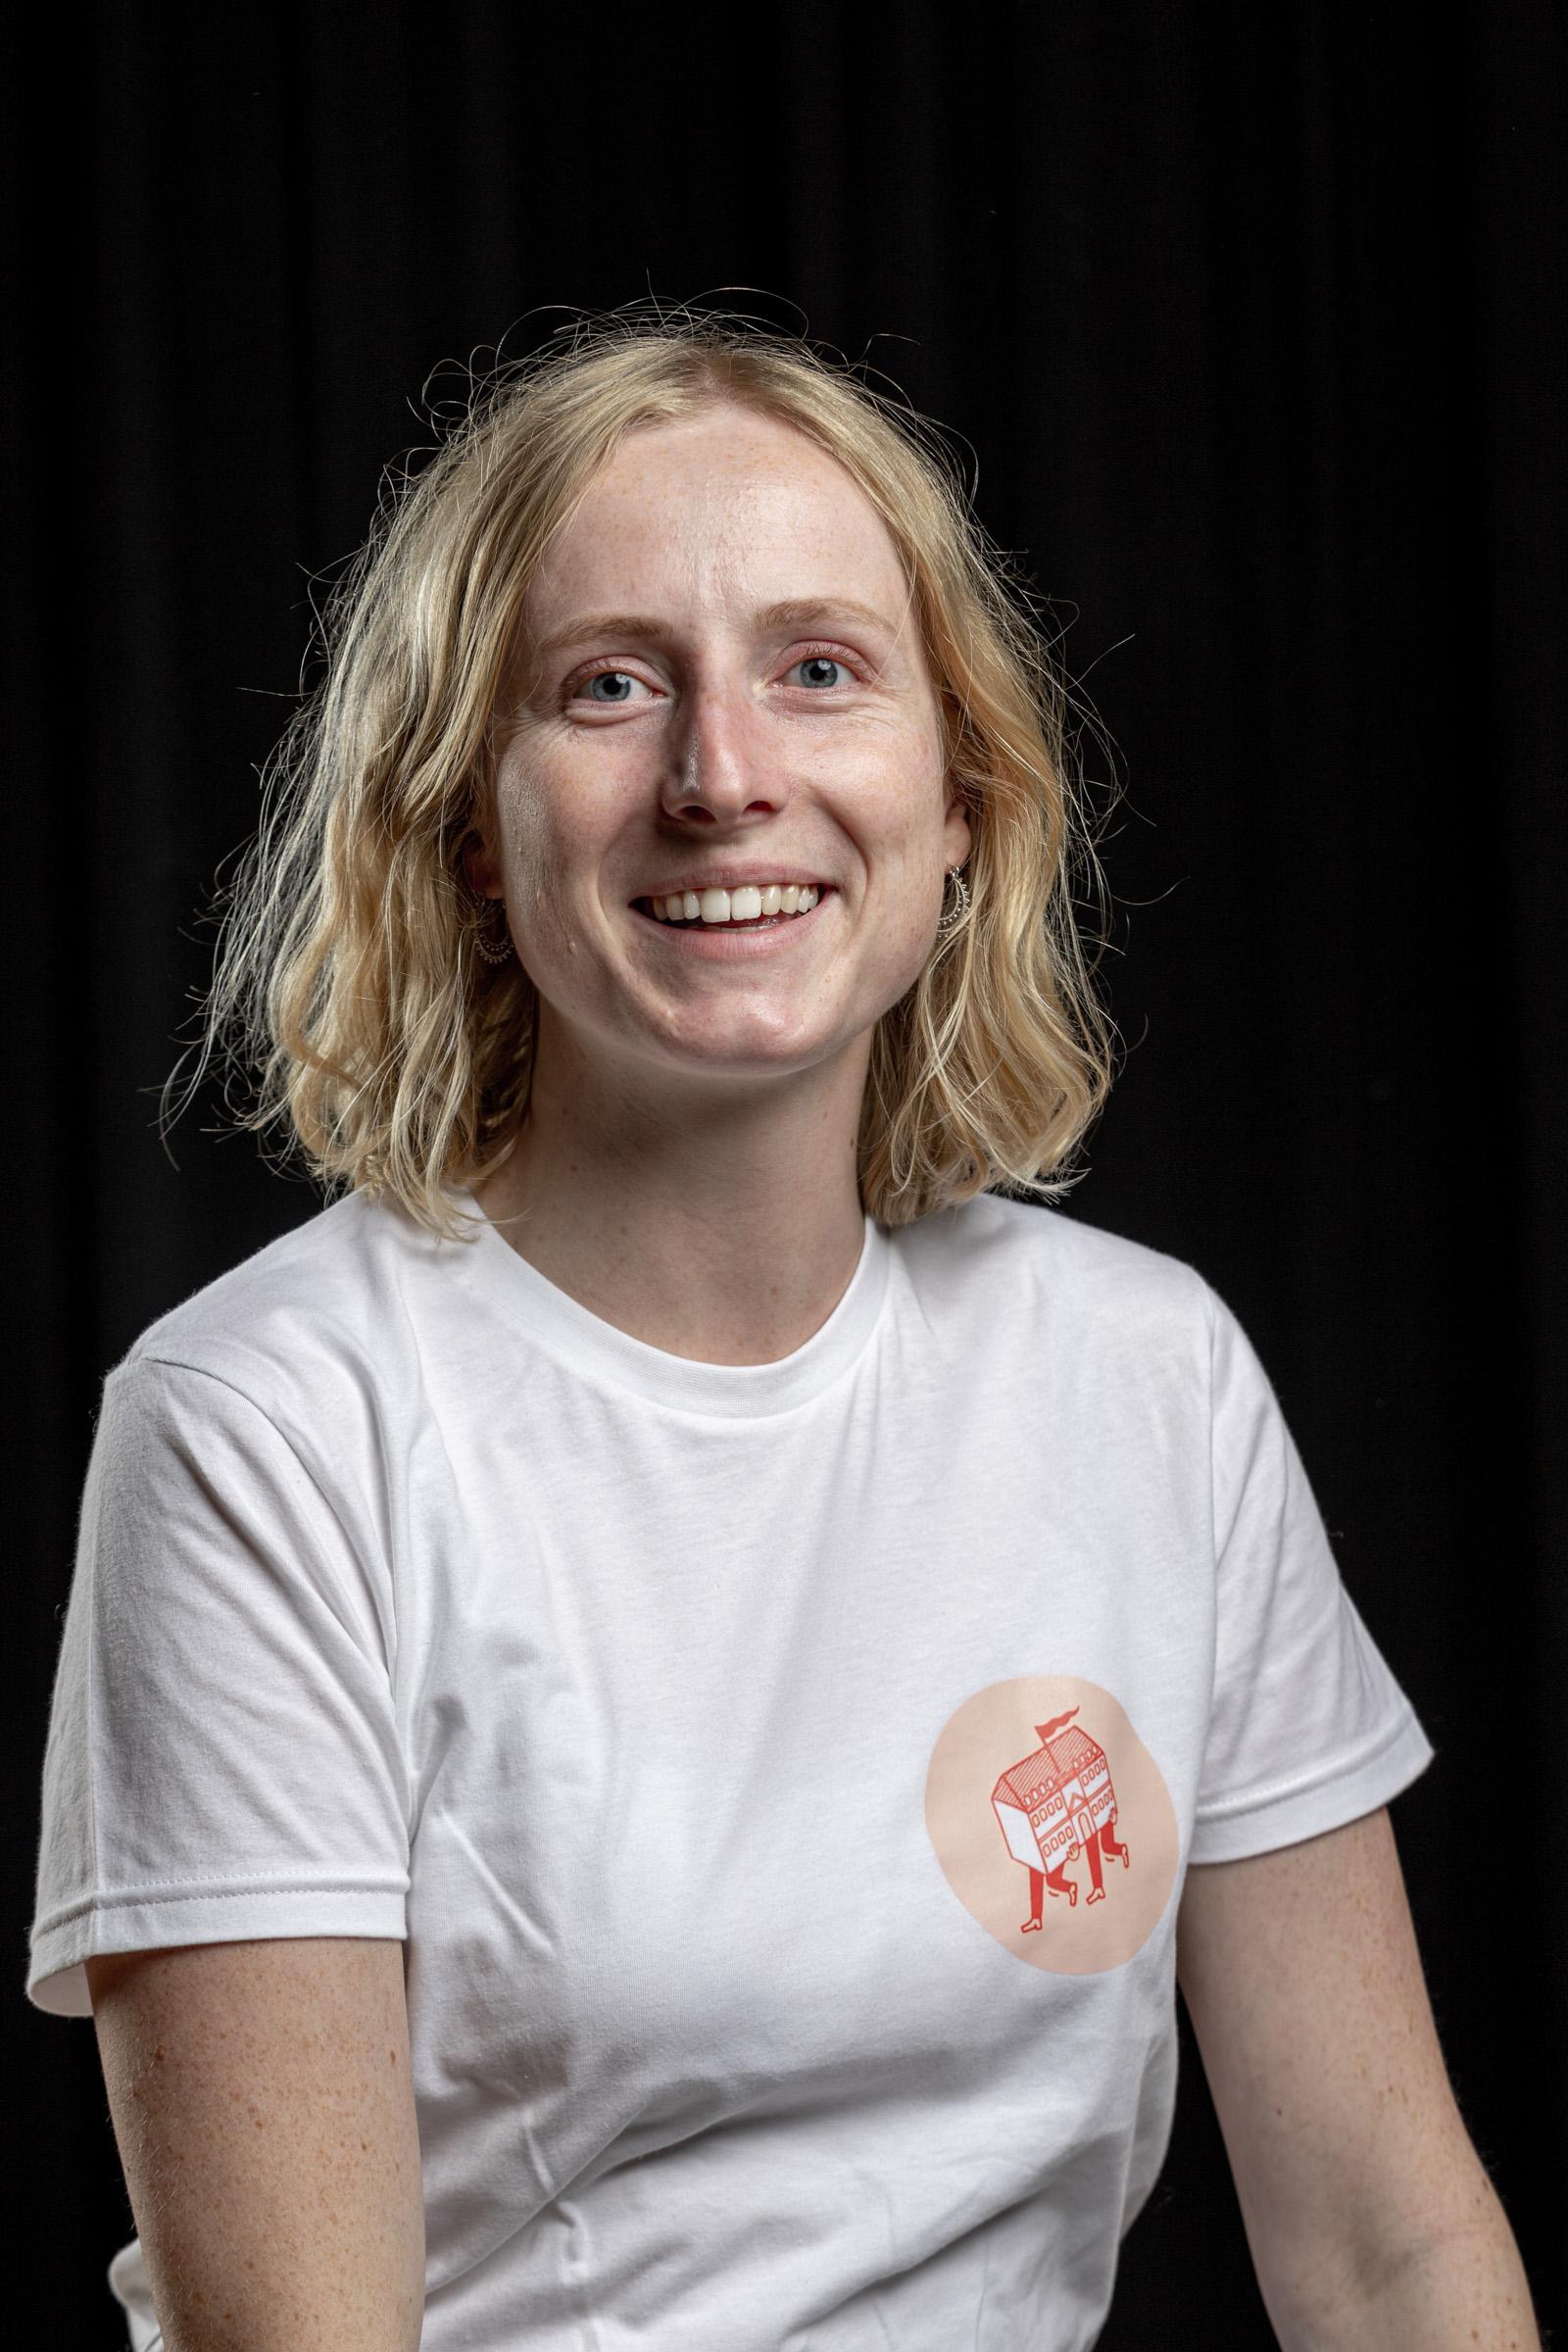 Katrine Bøtker Laursen